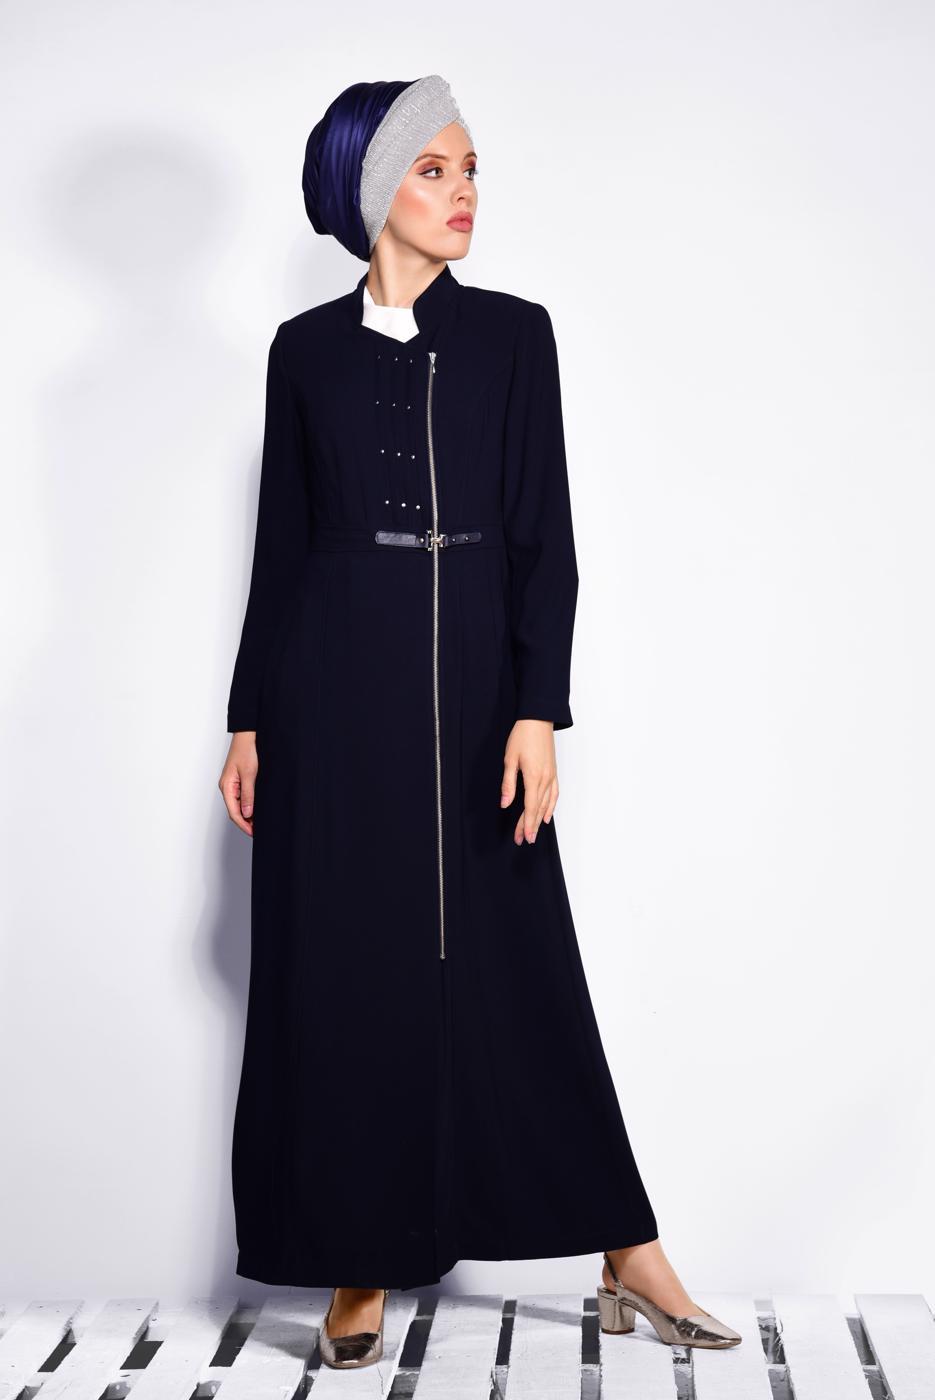 Bayan LACİVERT T 1036 Virona Tesettür Pardesü-Alv Fashion